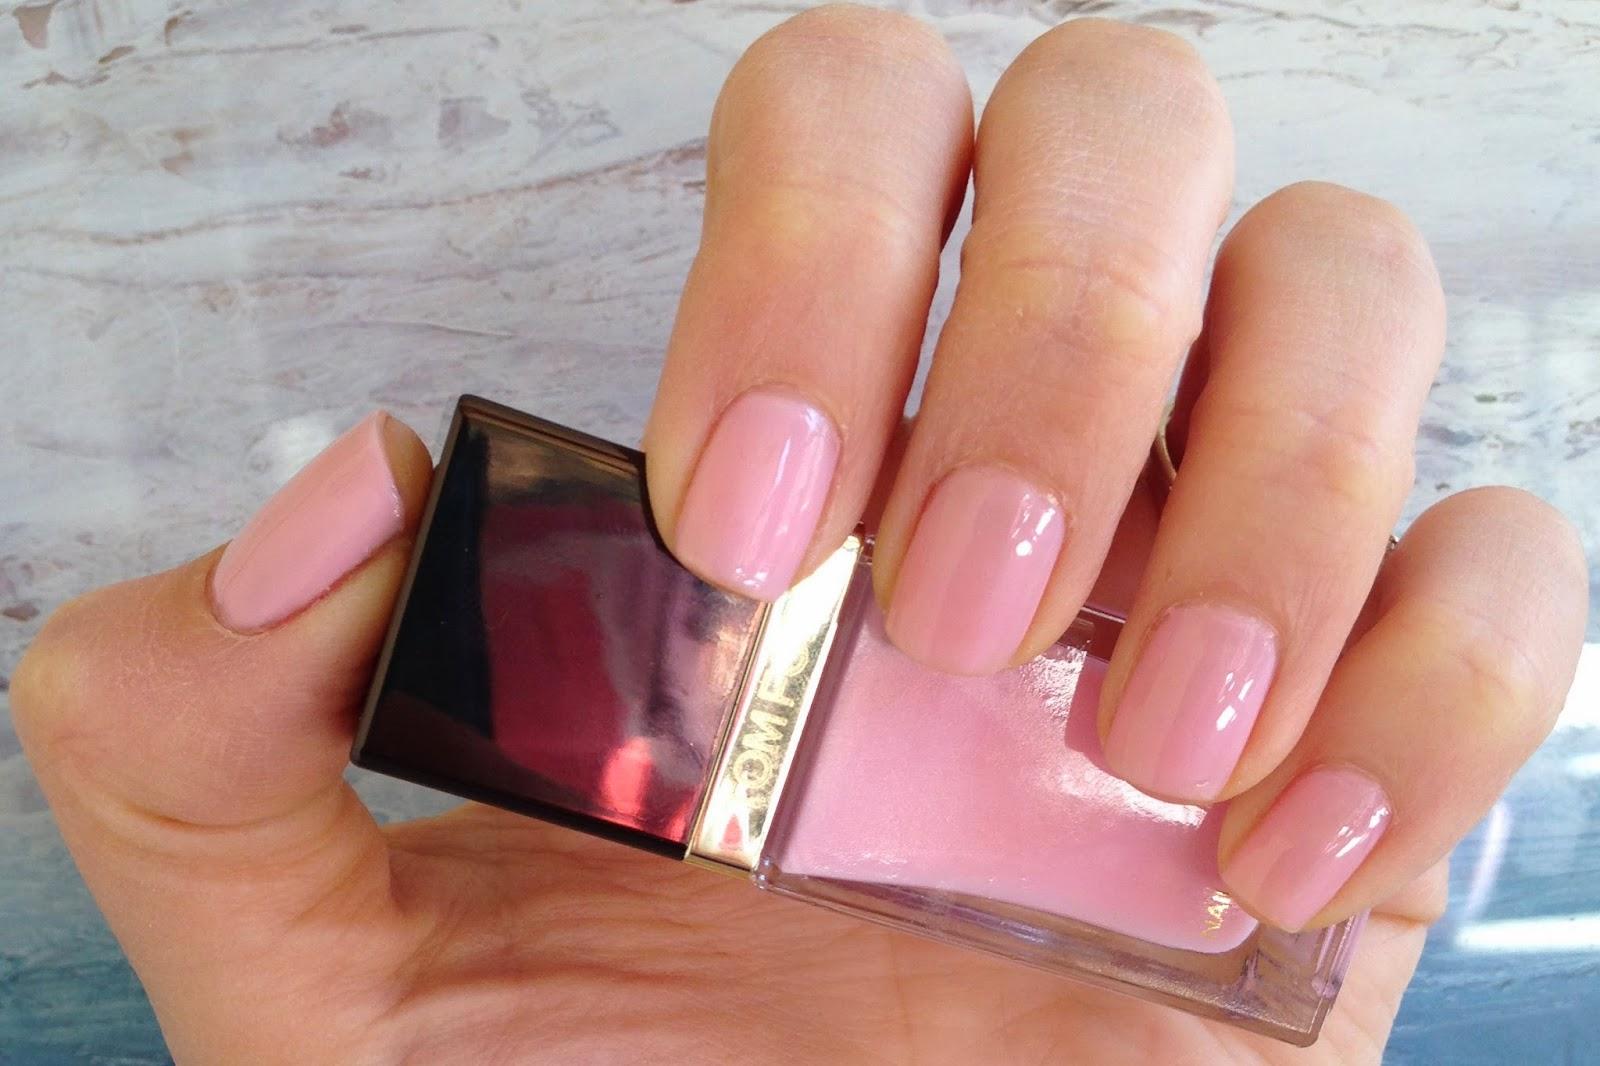 Ansa\'s Beauty and fashion blog: Tom Ford Pink Crush nail polish swatch